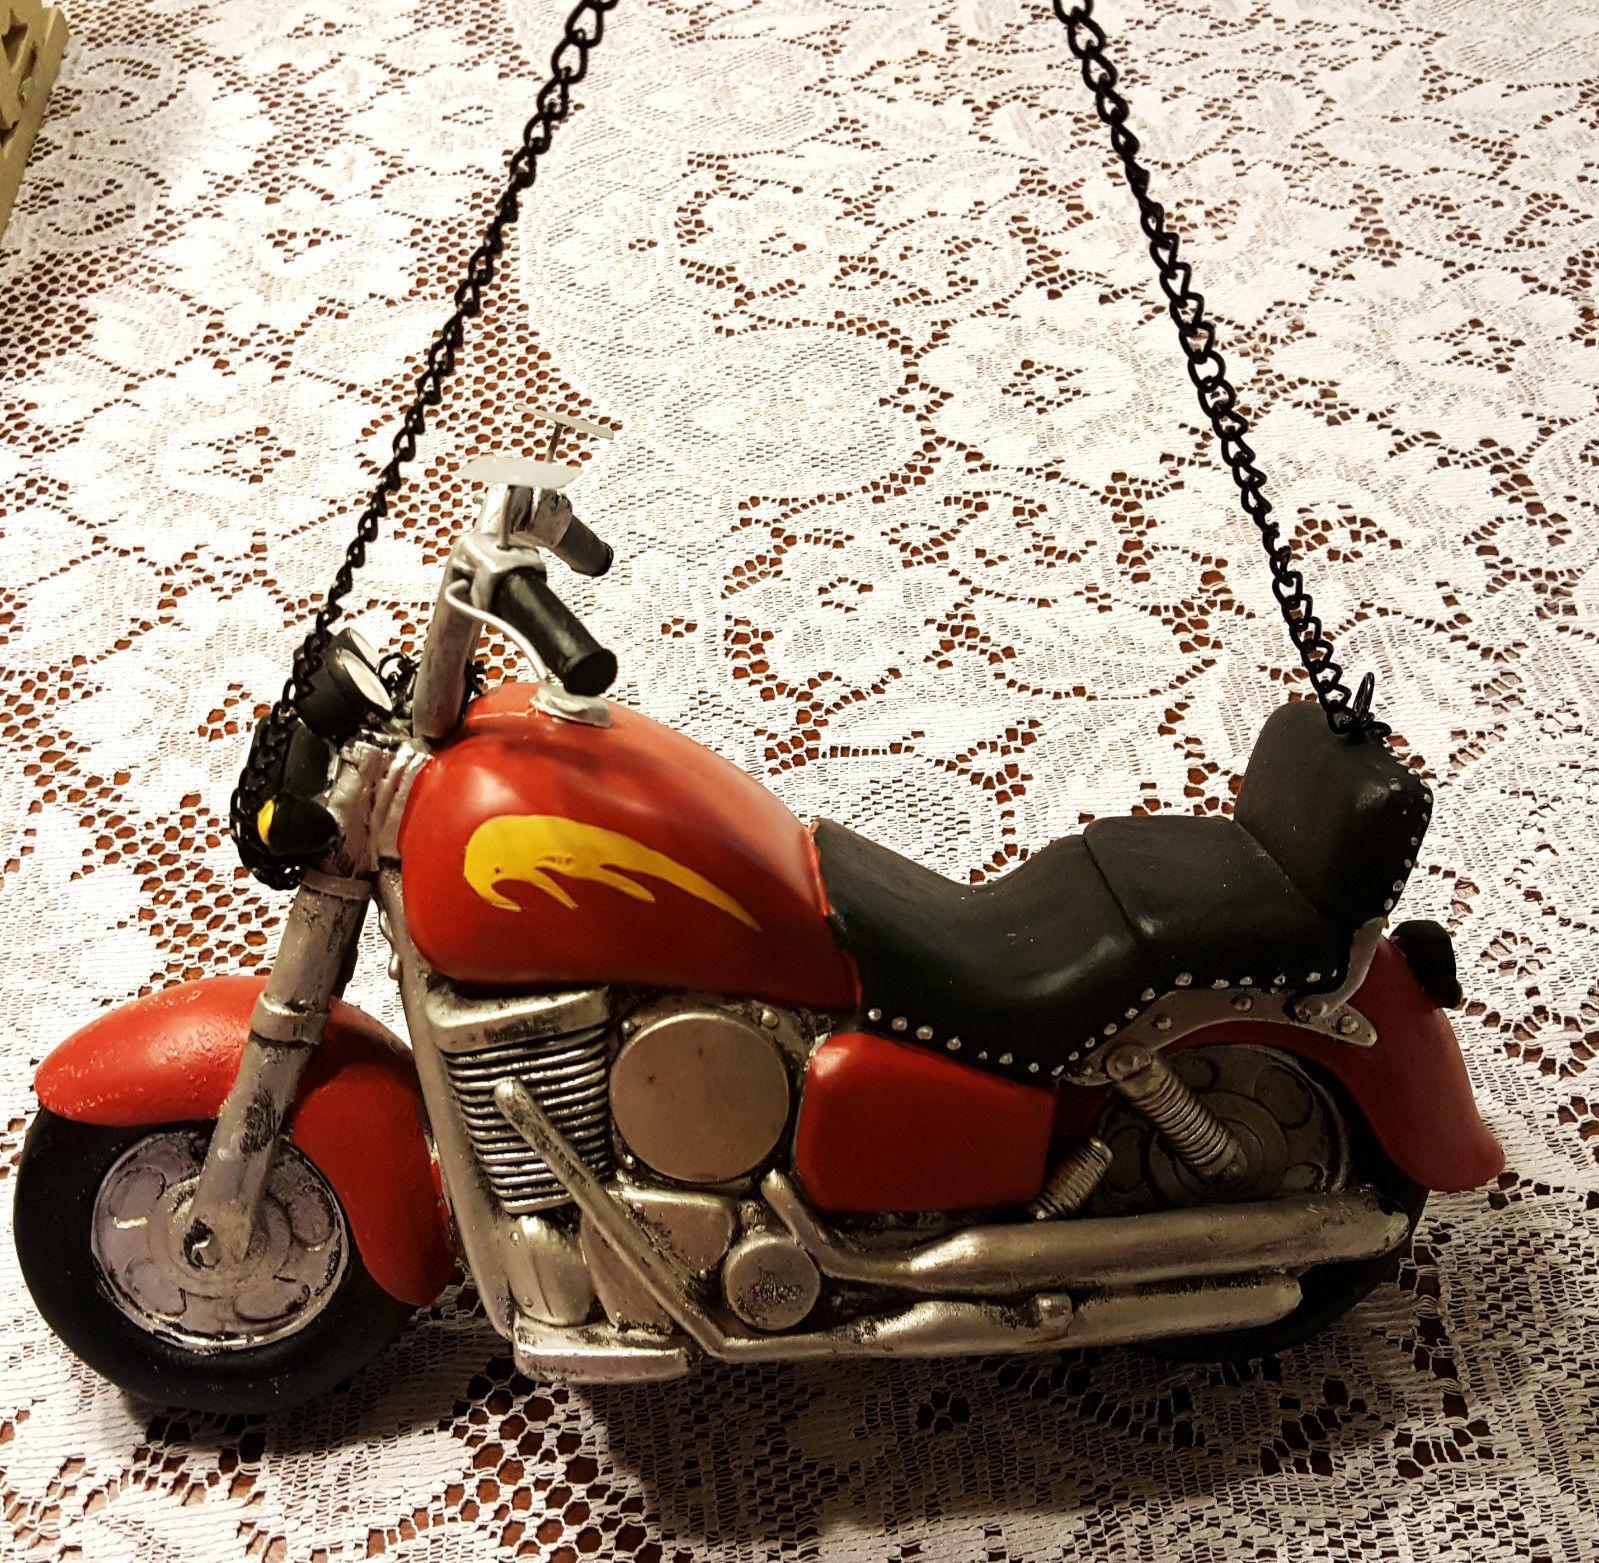 Harley Davidson Motorcycle Piggy Bank